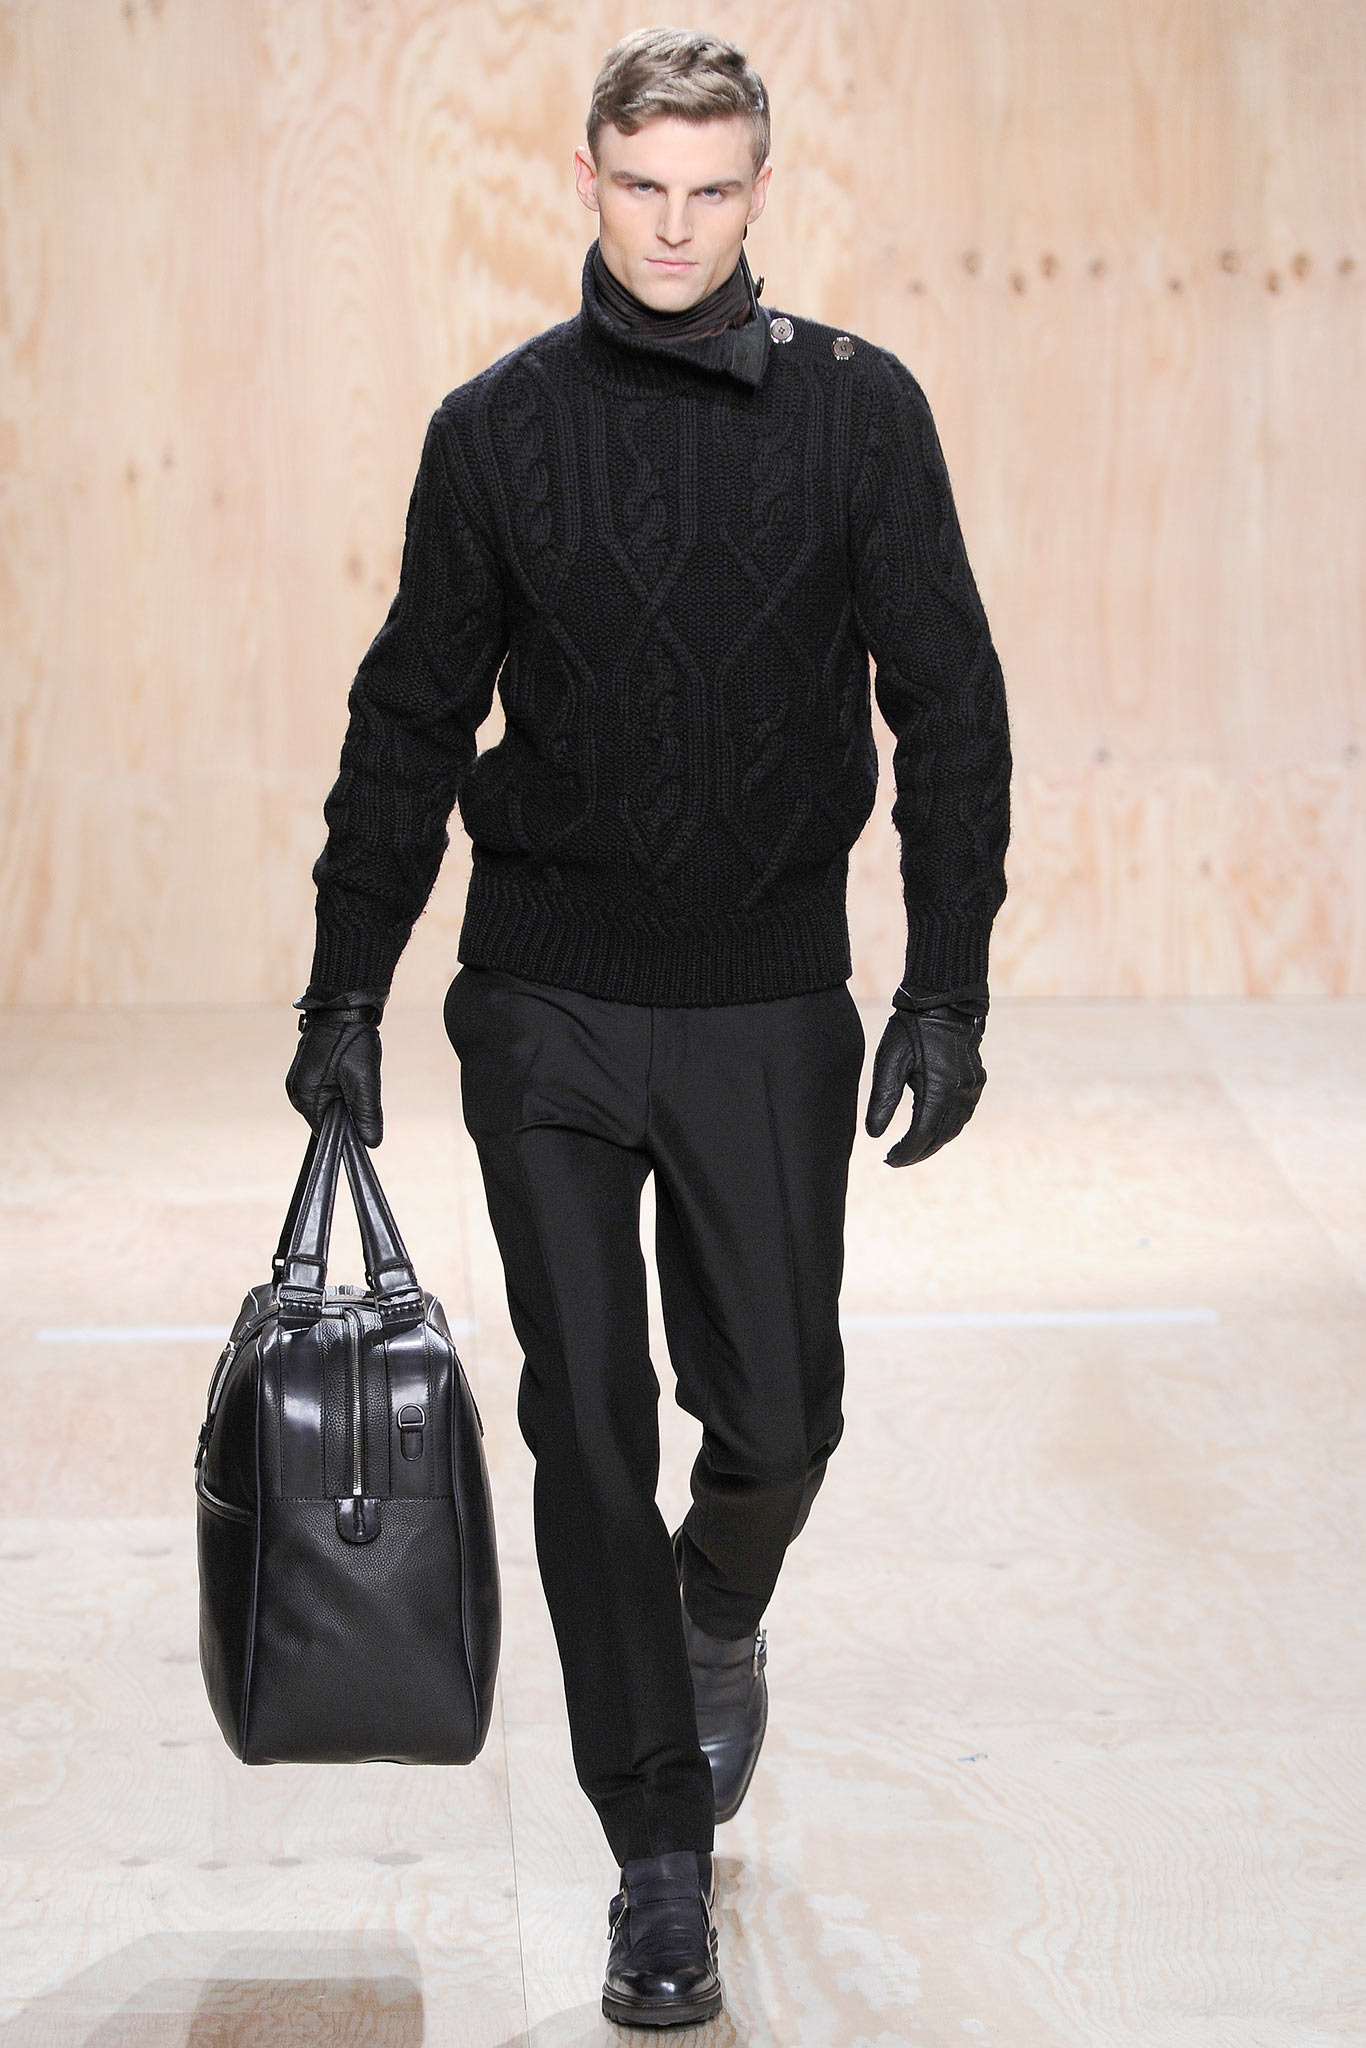 mens fashion style types photo - 1